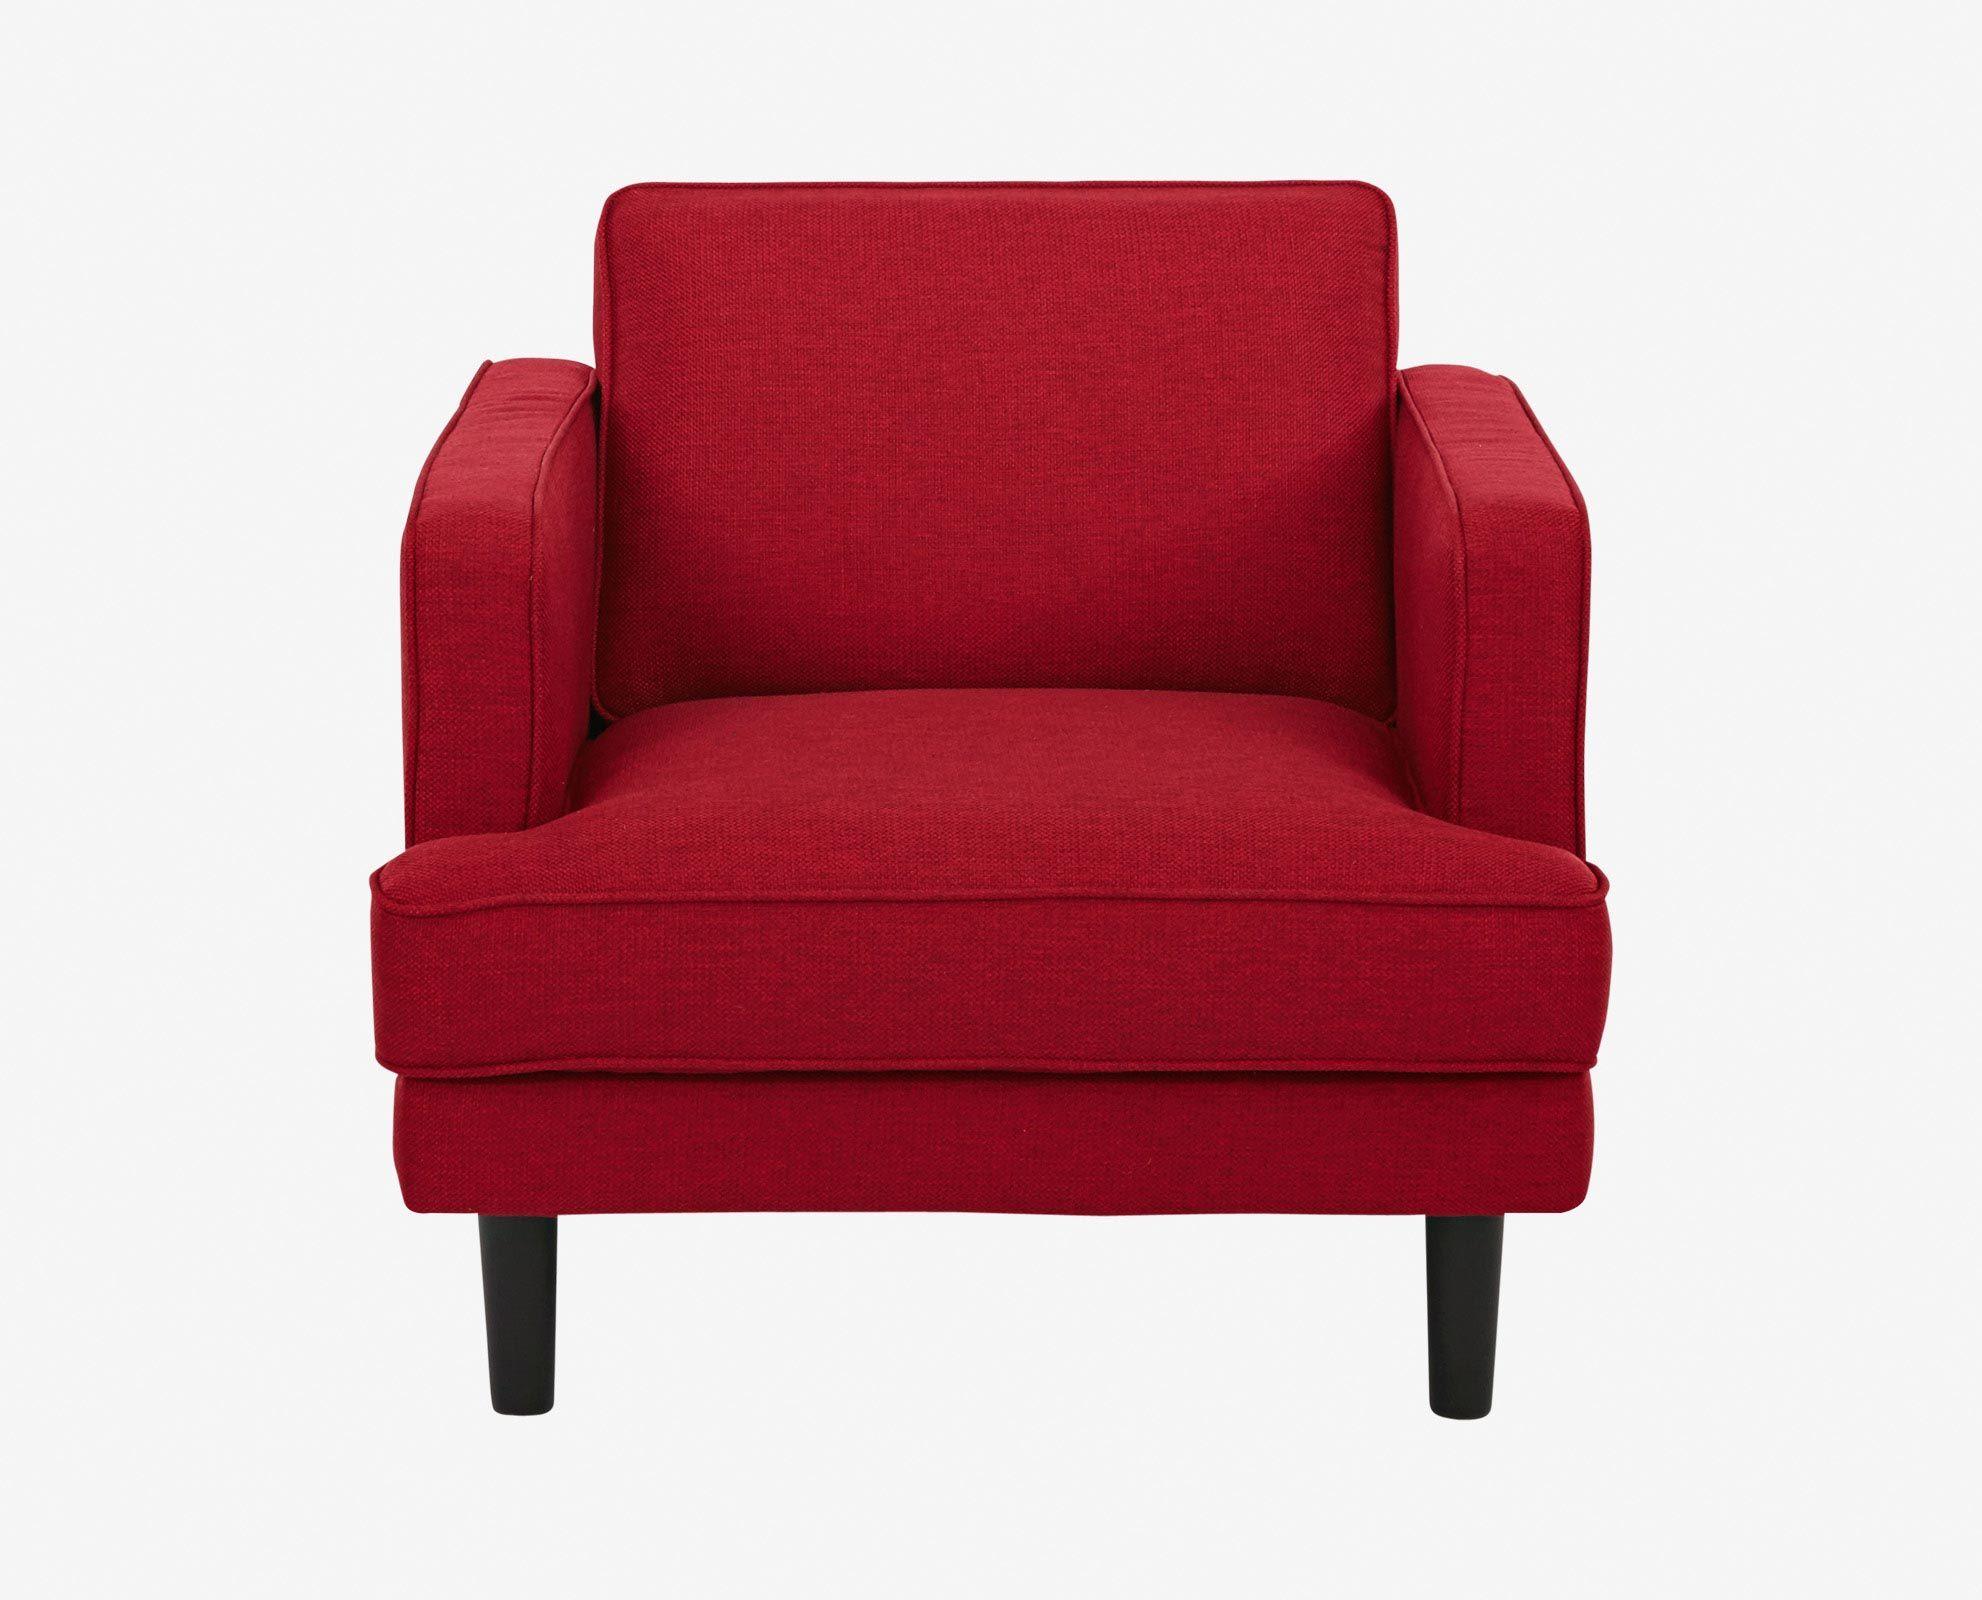 Liam Chair Chairs Scandinavian Designs